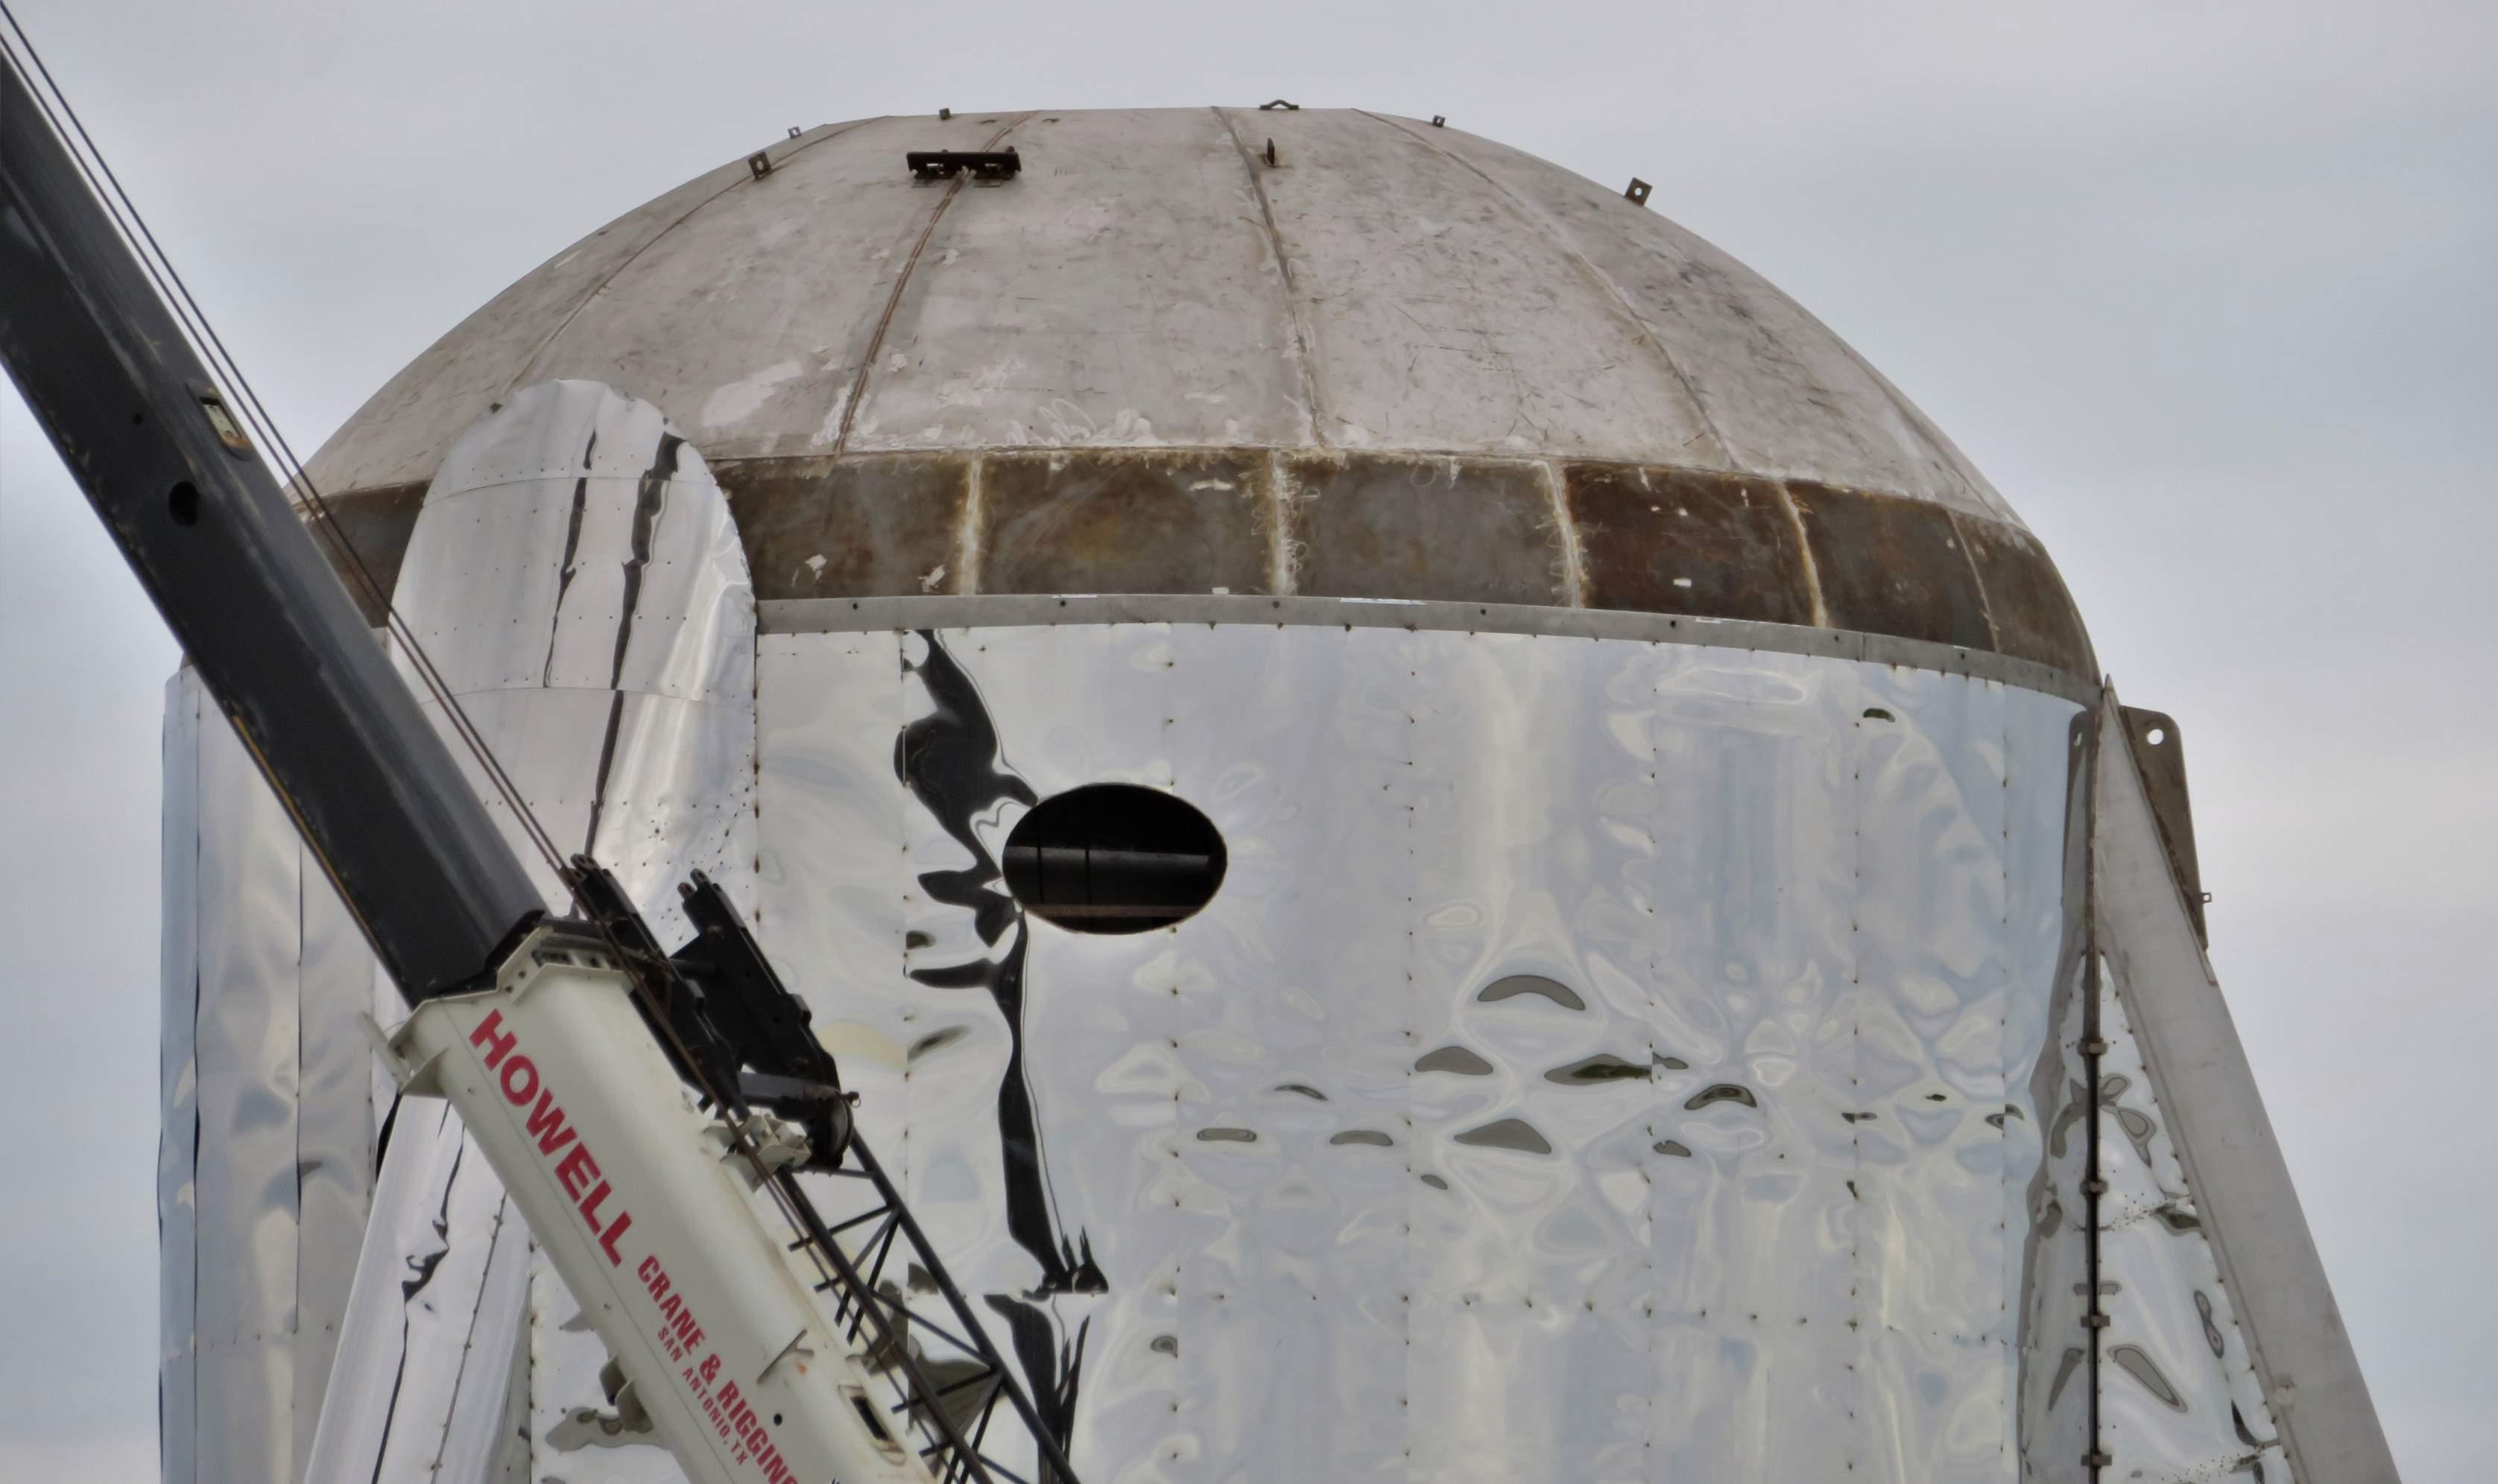 Boca Chica Starship dome work 012519 (NASASpaceflight – bocachicagal) 5 (c)